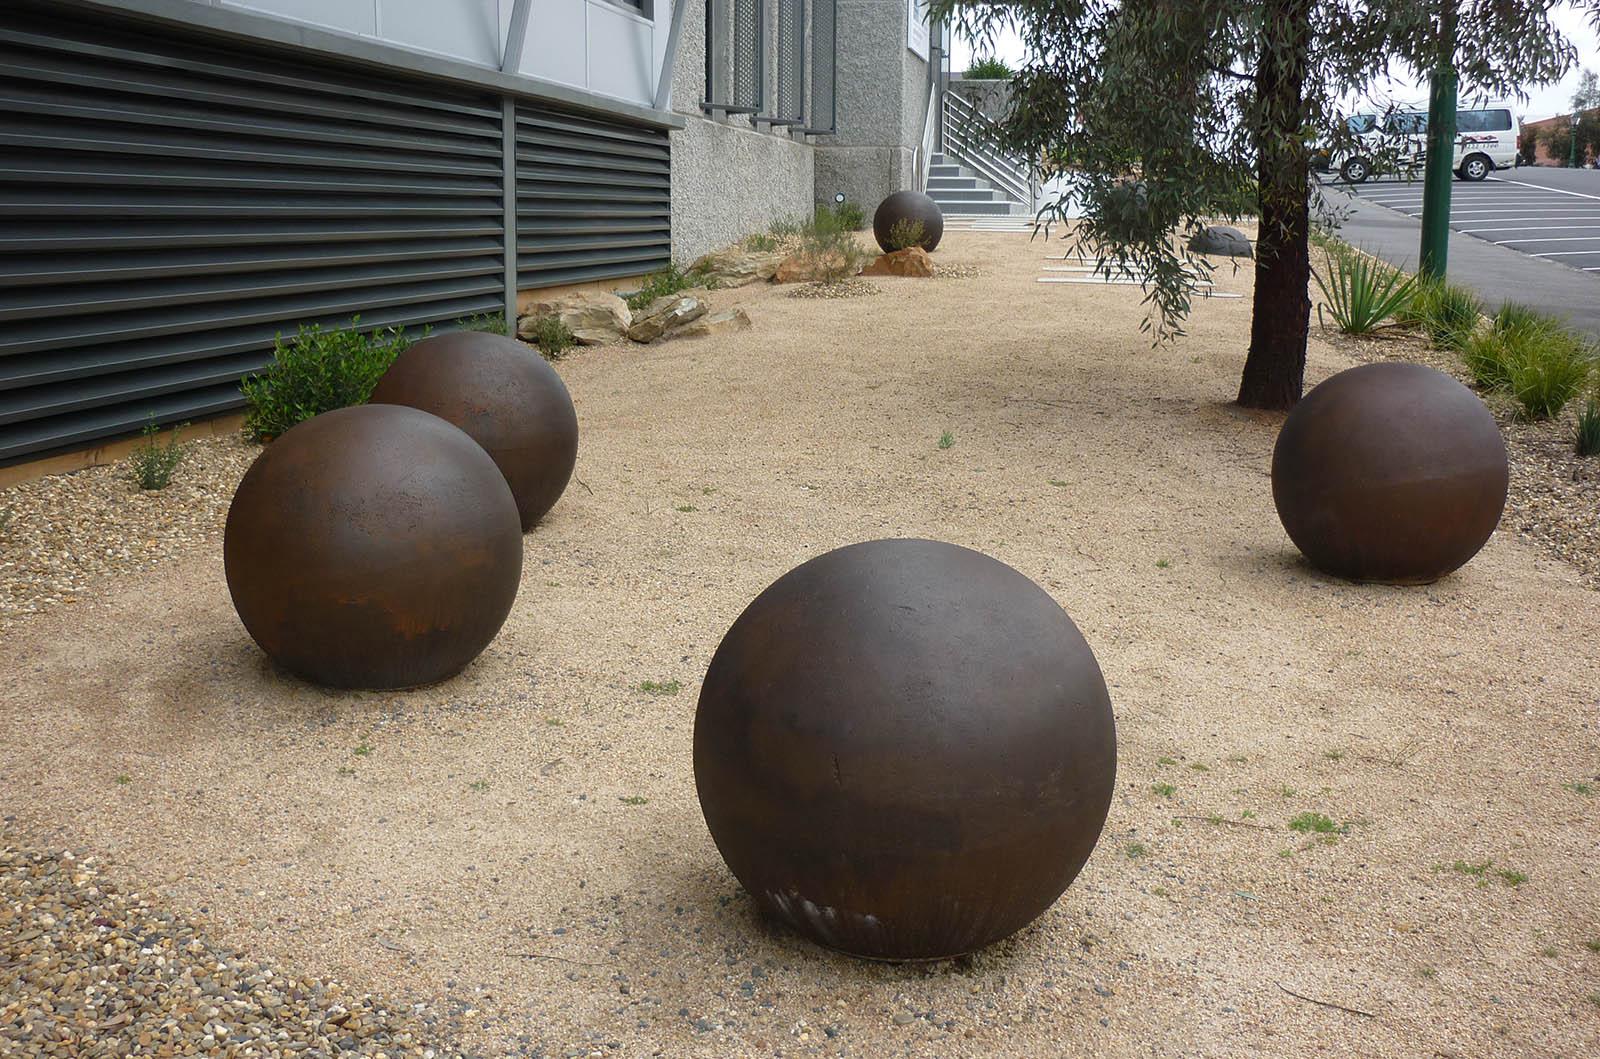 Customs_0005_Concrete spheres for Shire of Bendigo